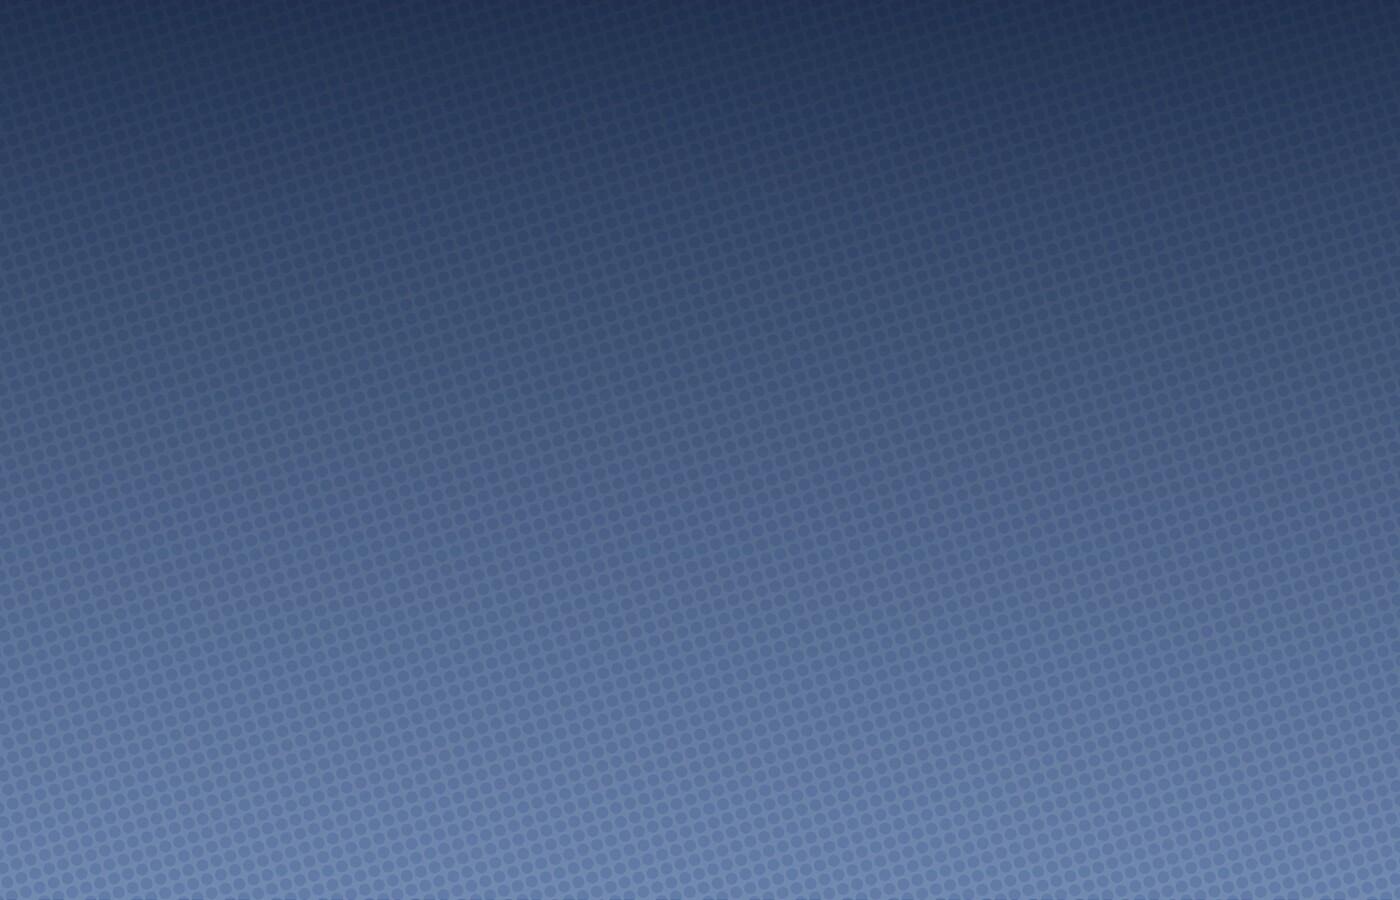 dots-gradient-background-4k-8f.jpg